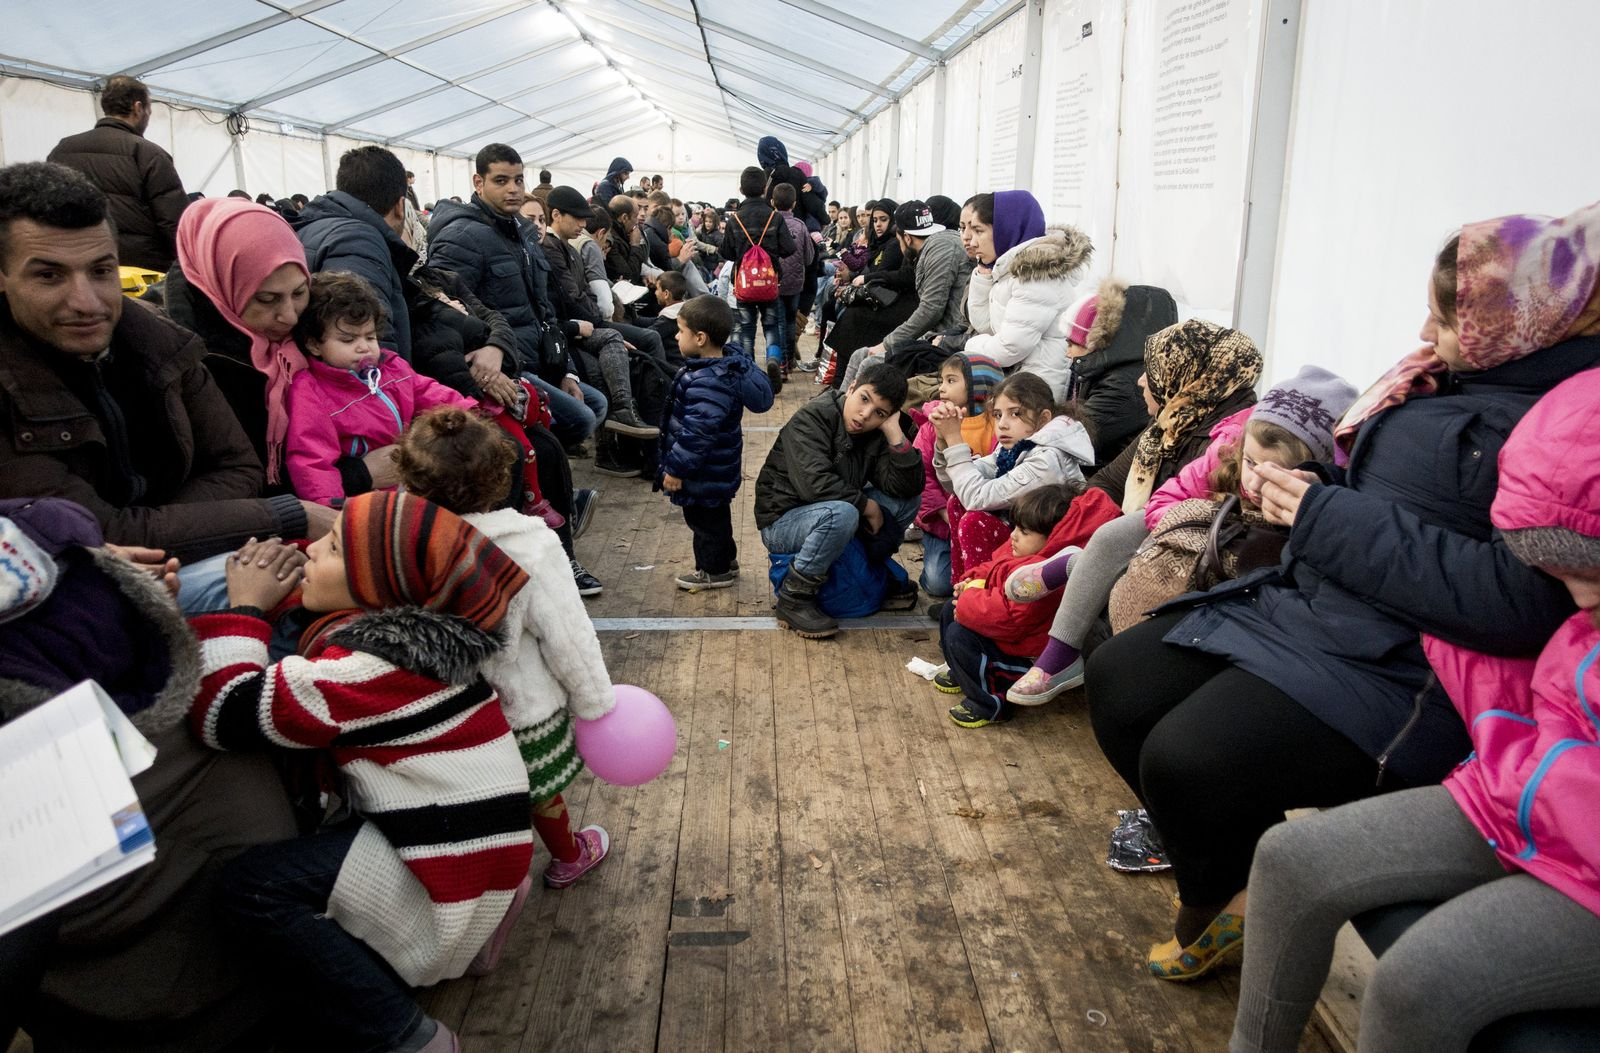 Situation am LaGeSo Flüchtlinge